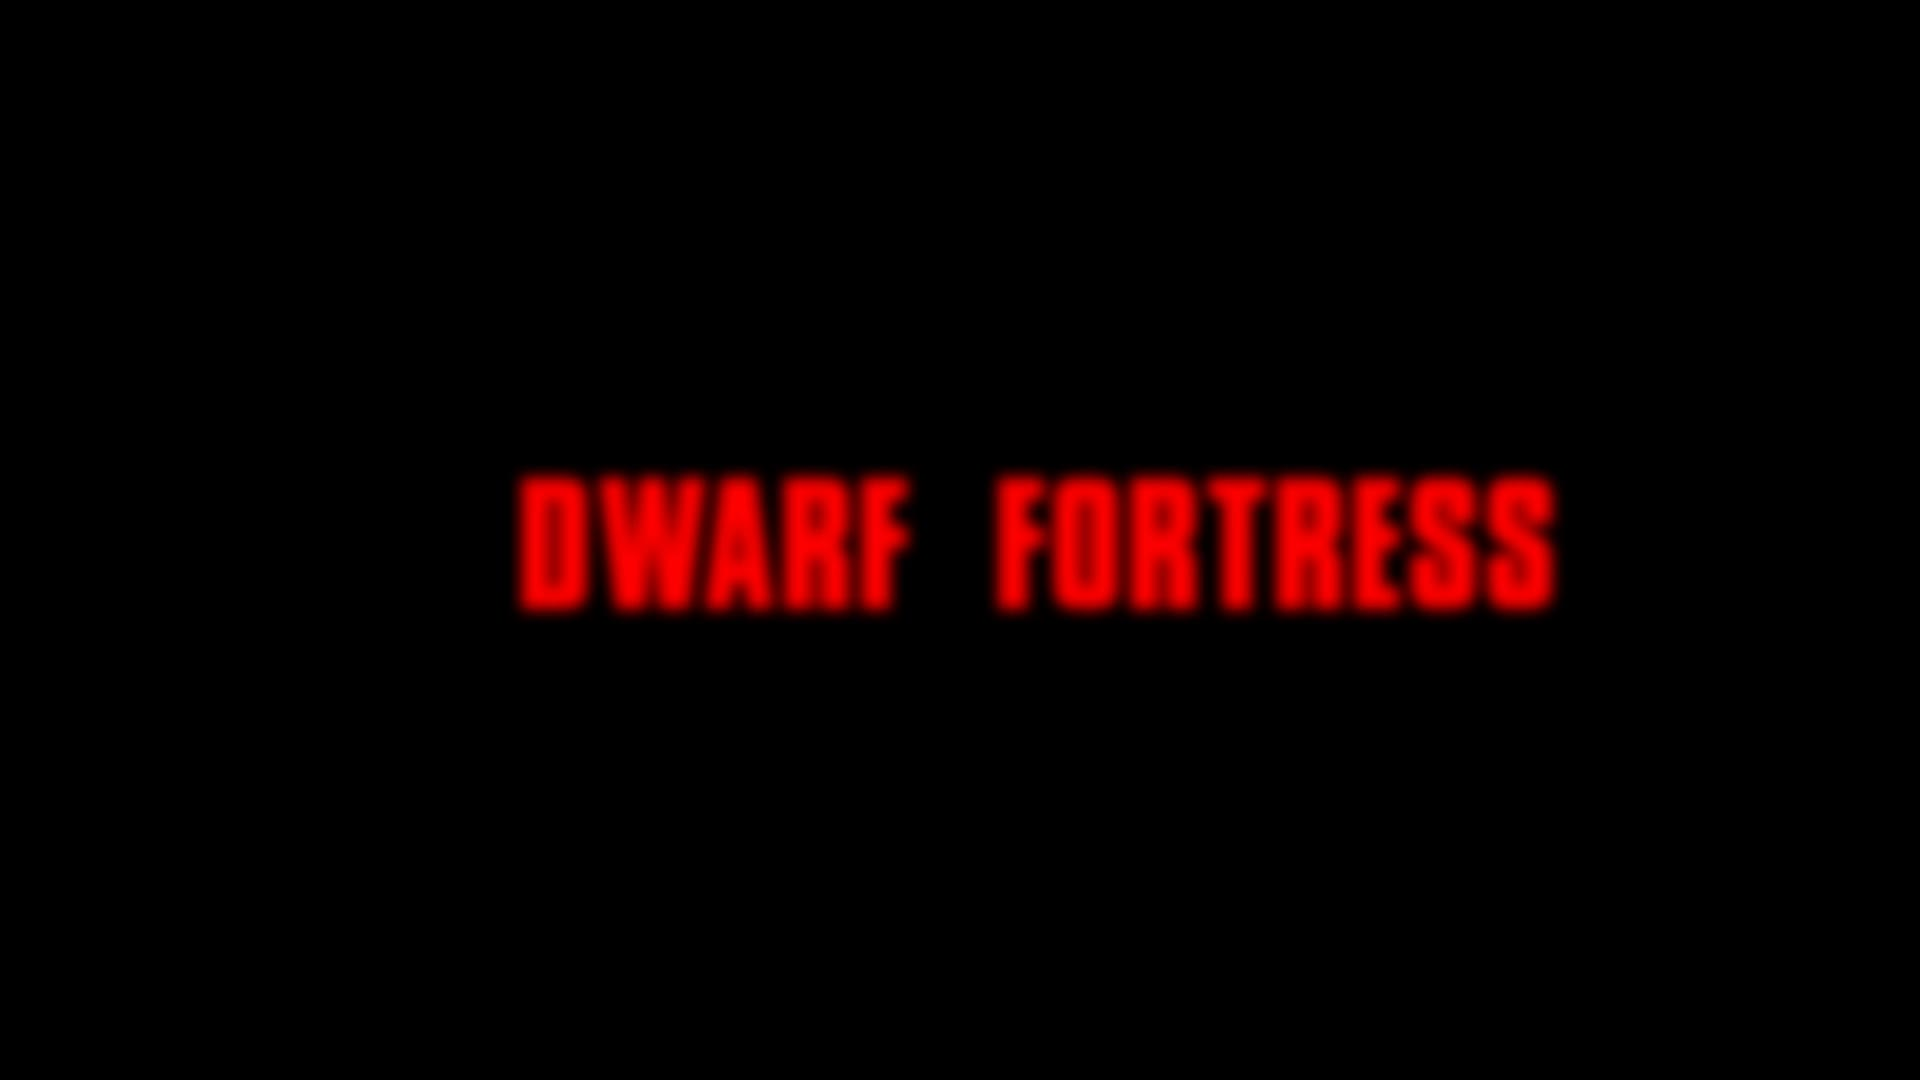 dwarffortress, opentoonz, Dwarf Fortress Title FX Test GIFs